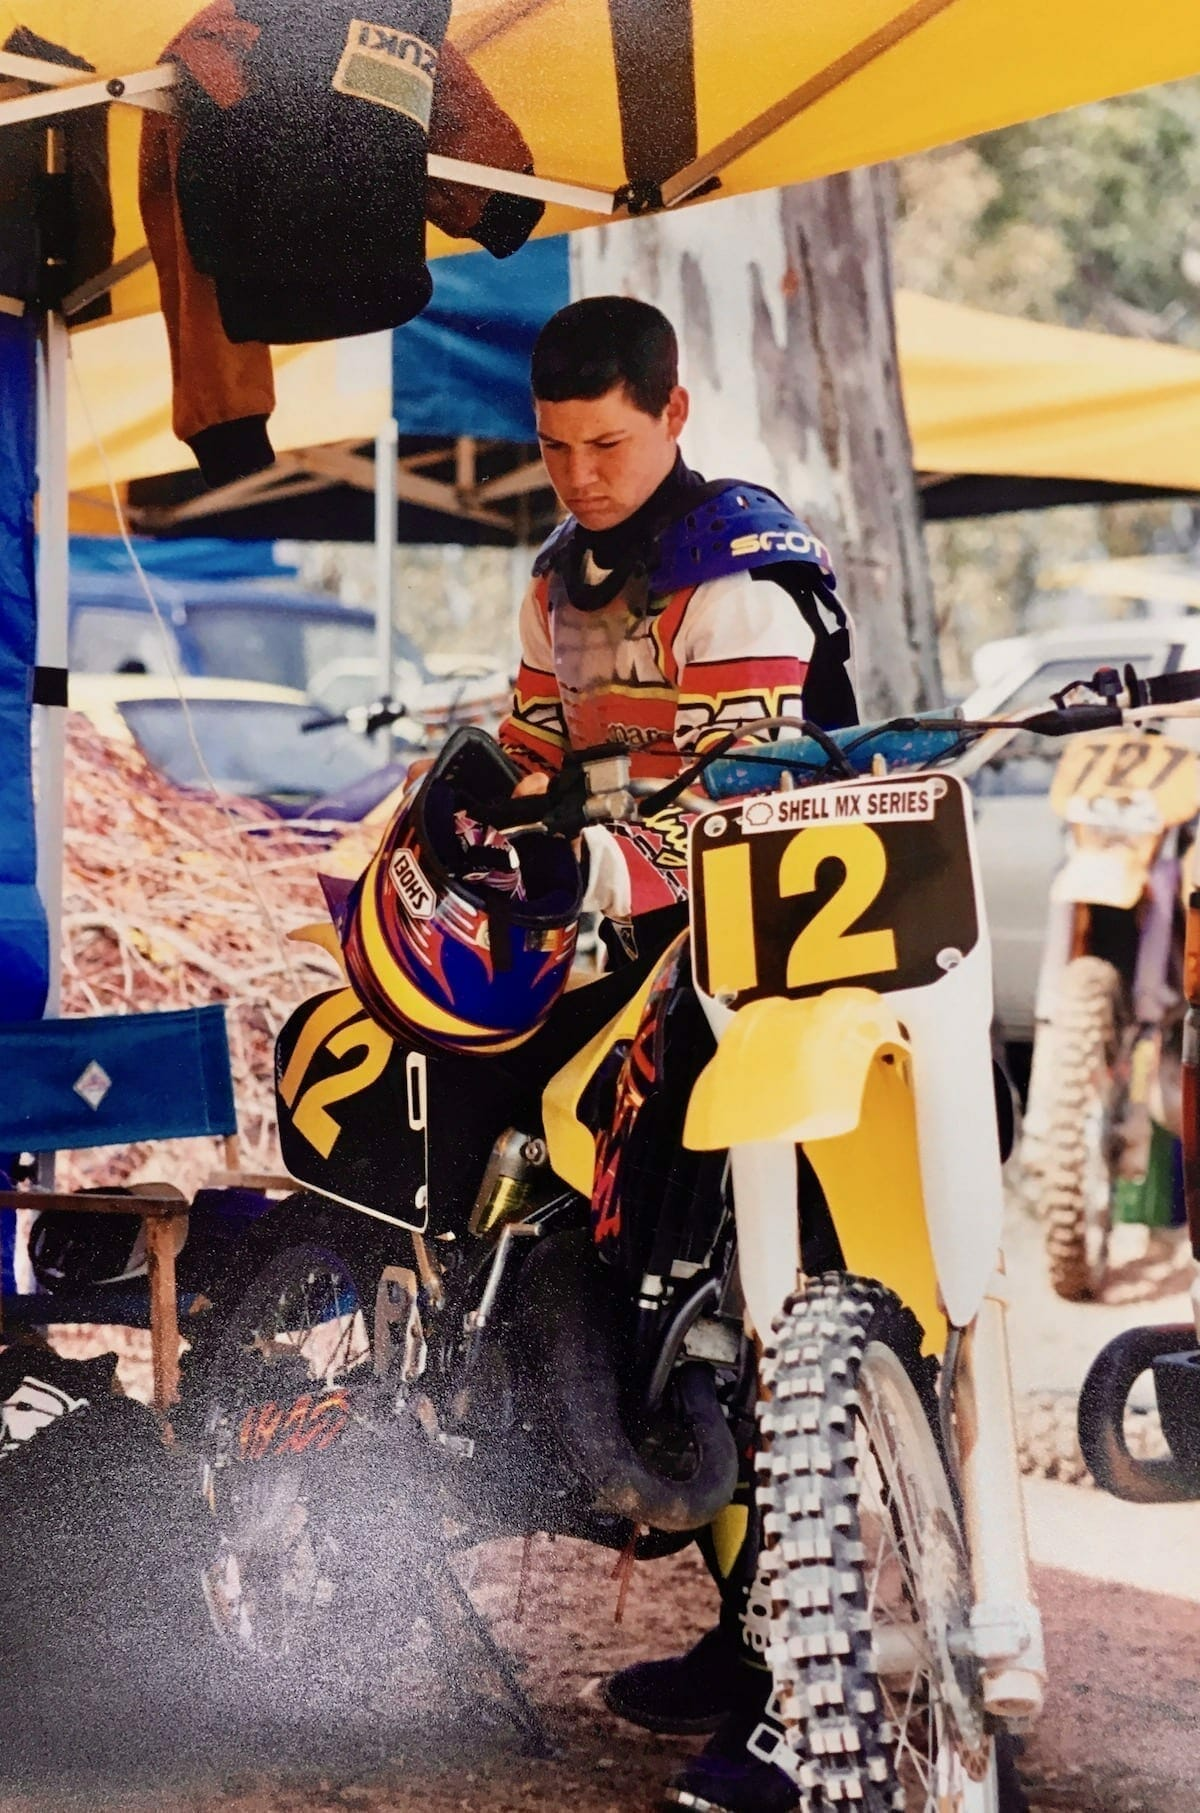 Chad Reed: Australian Jr. Motocross, circa 1996